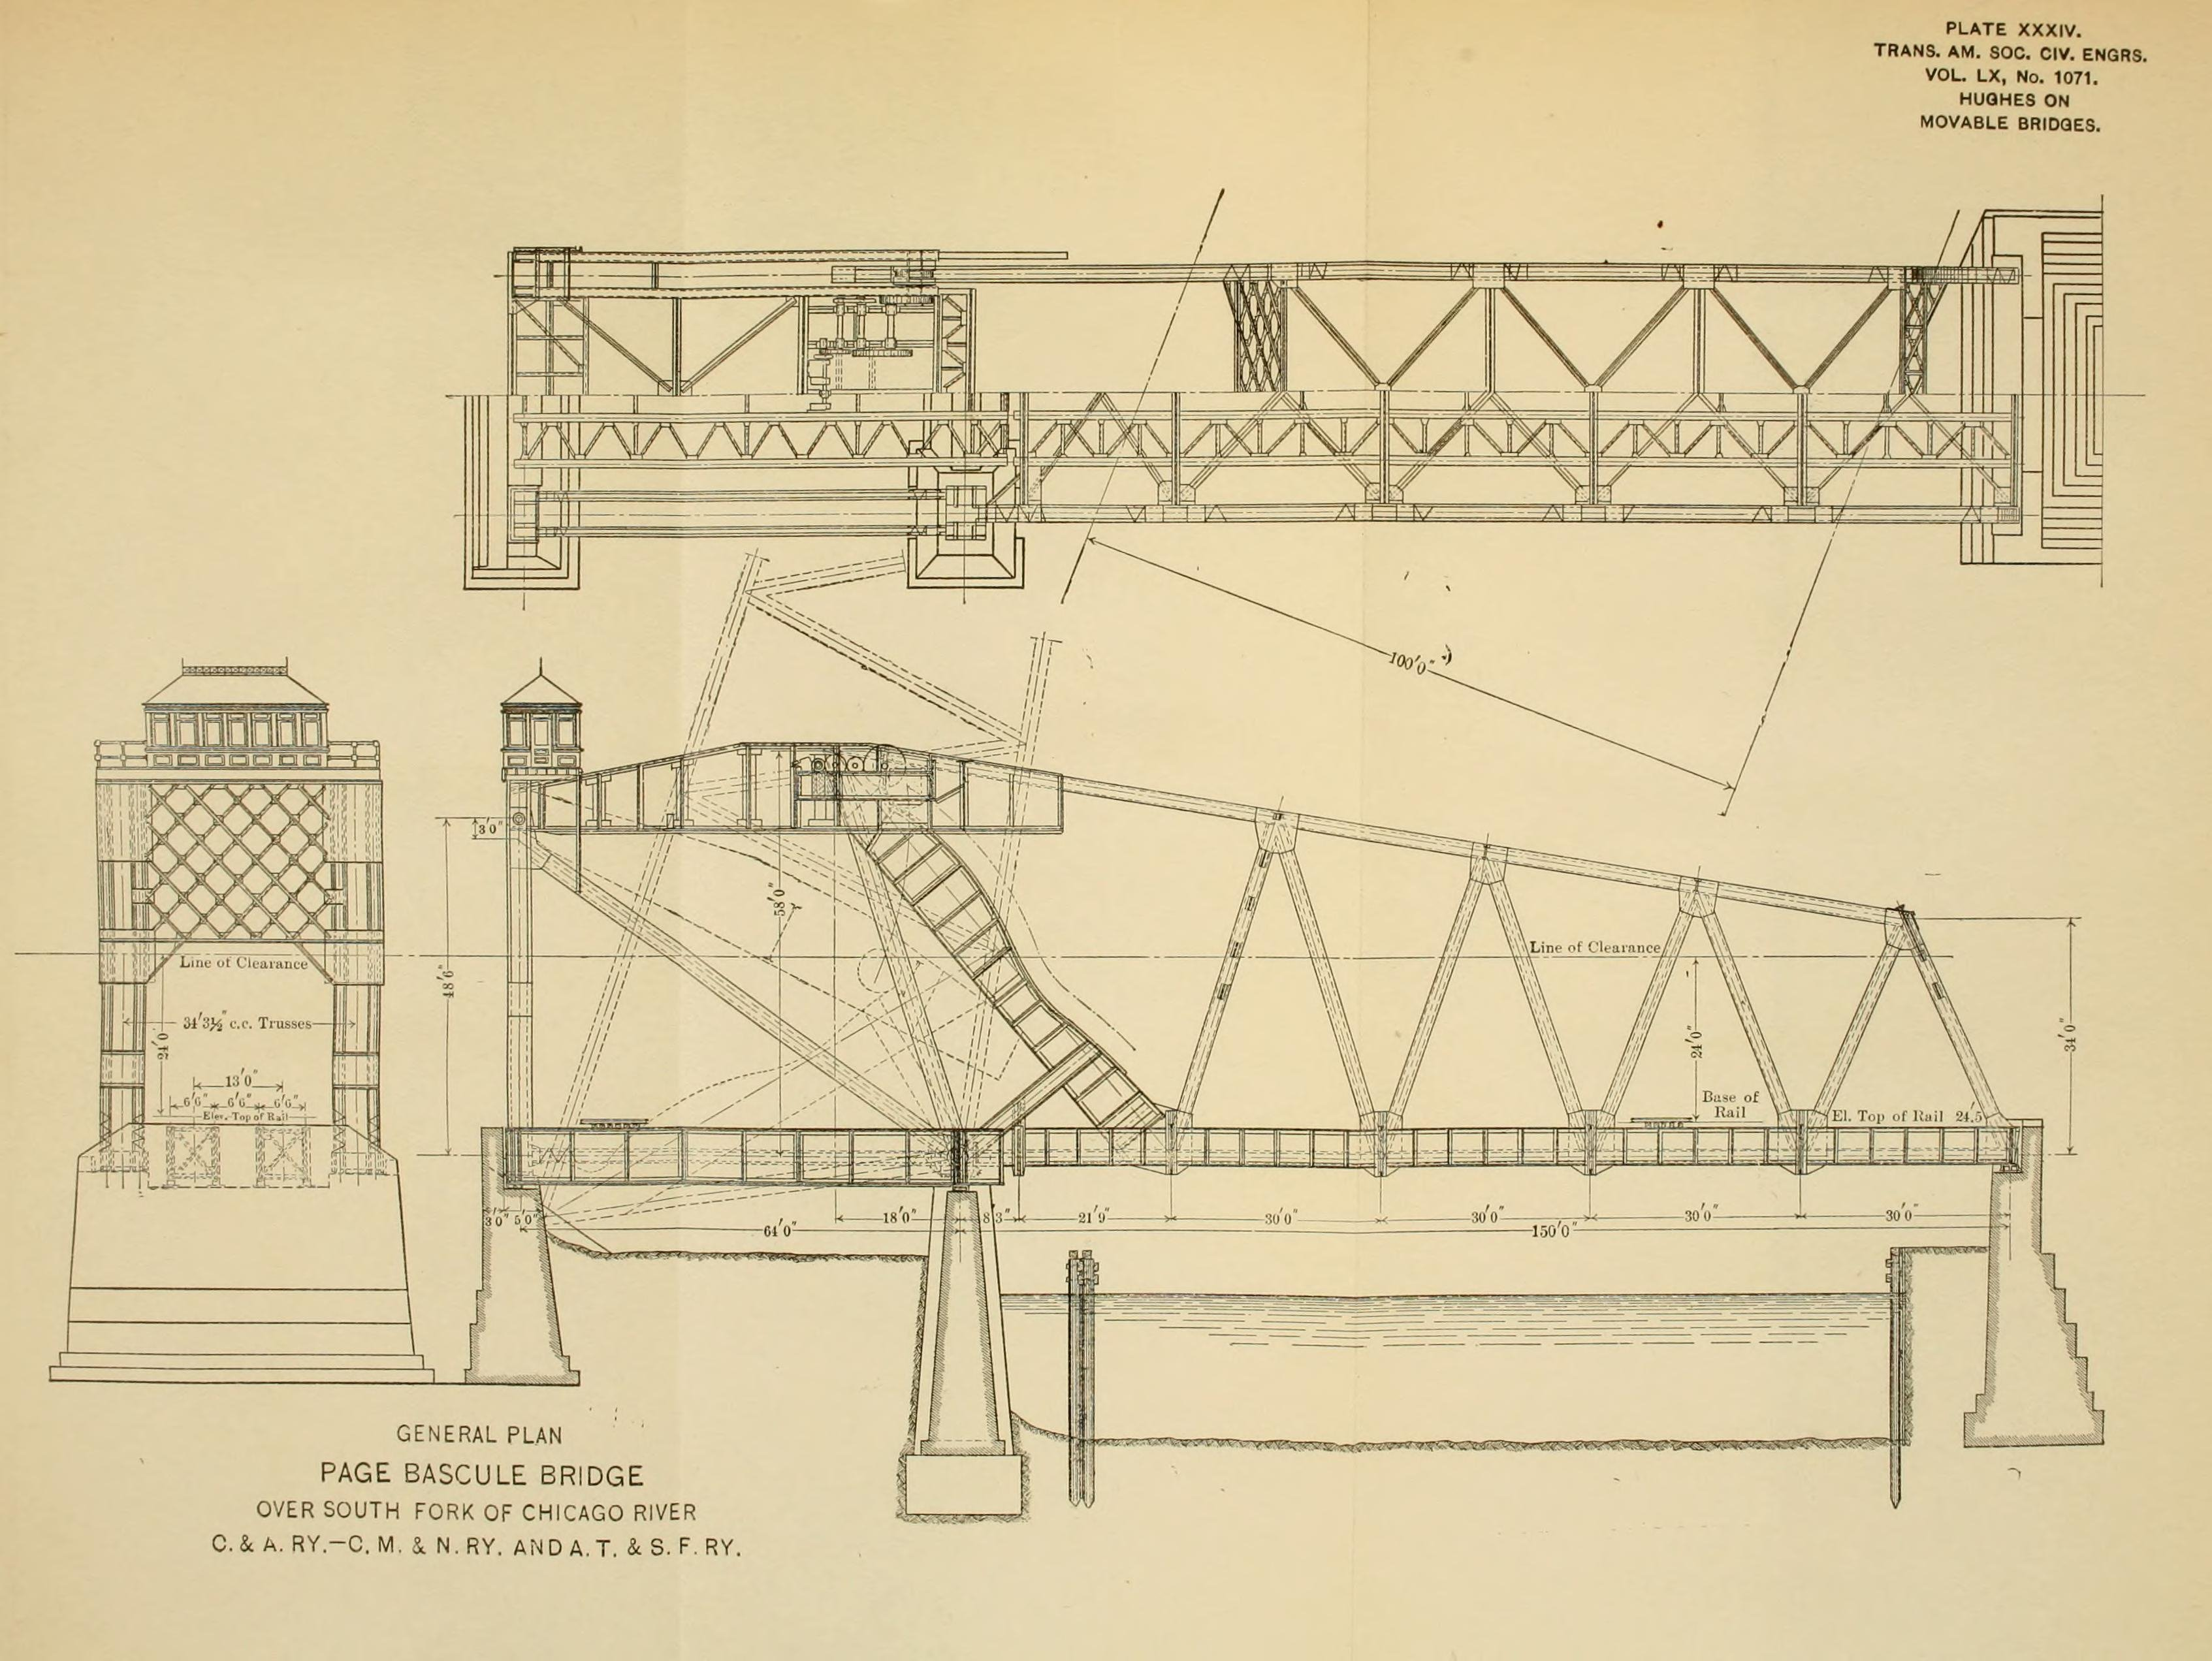 Architectural Drawings Of Bridges chicago and alton railroad bridge - historicbridges